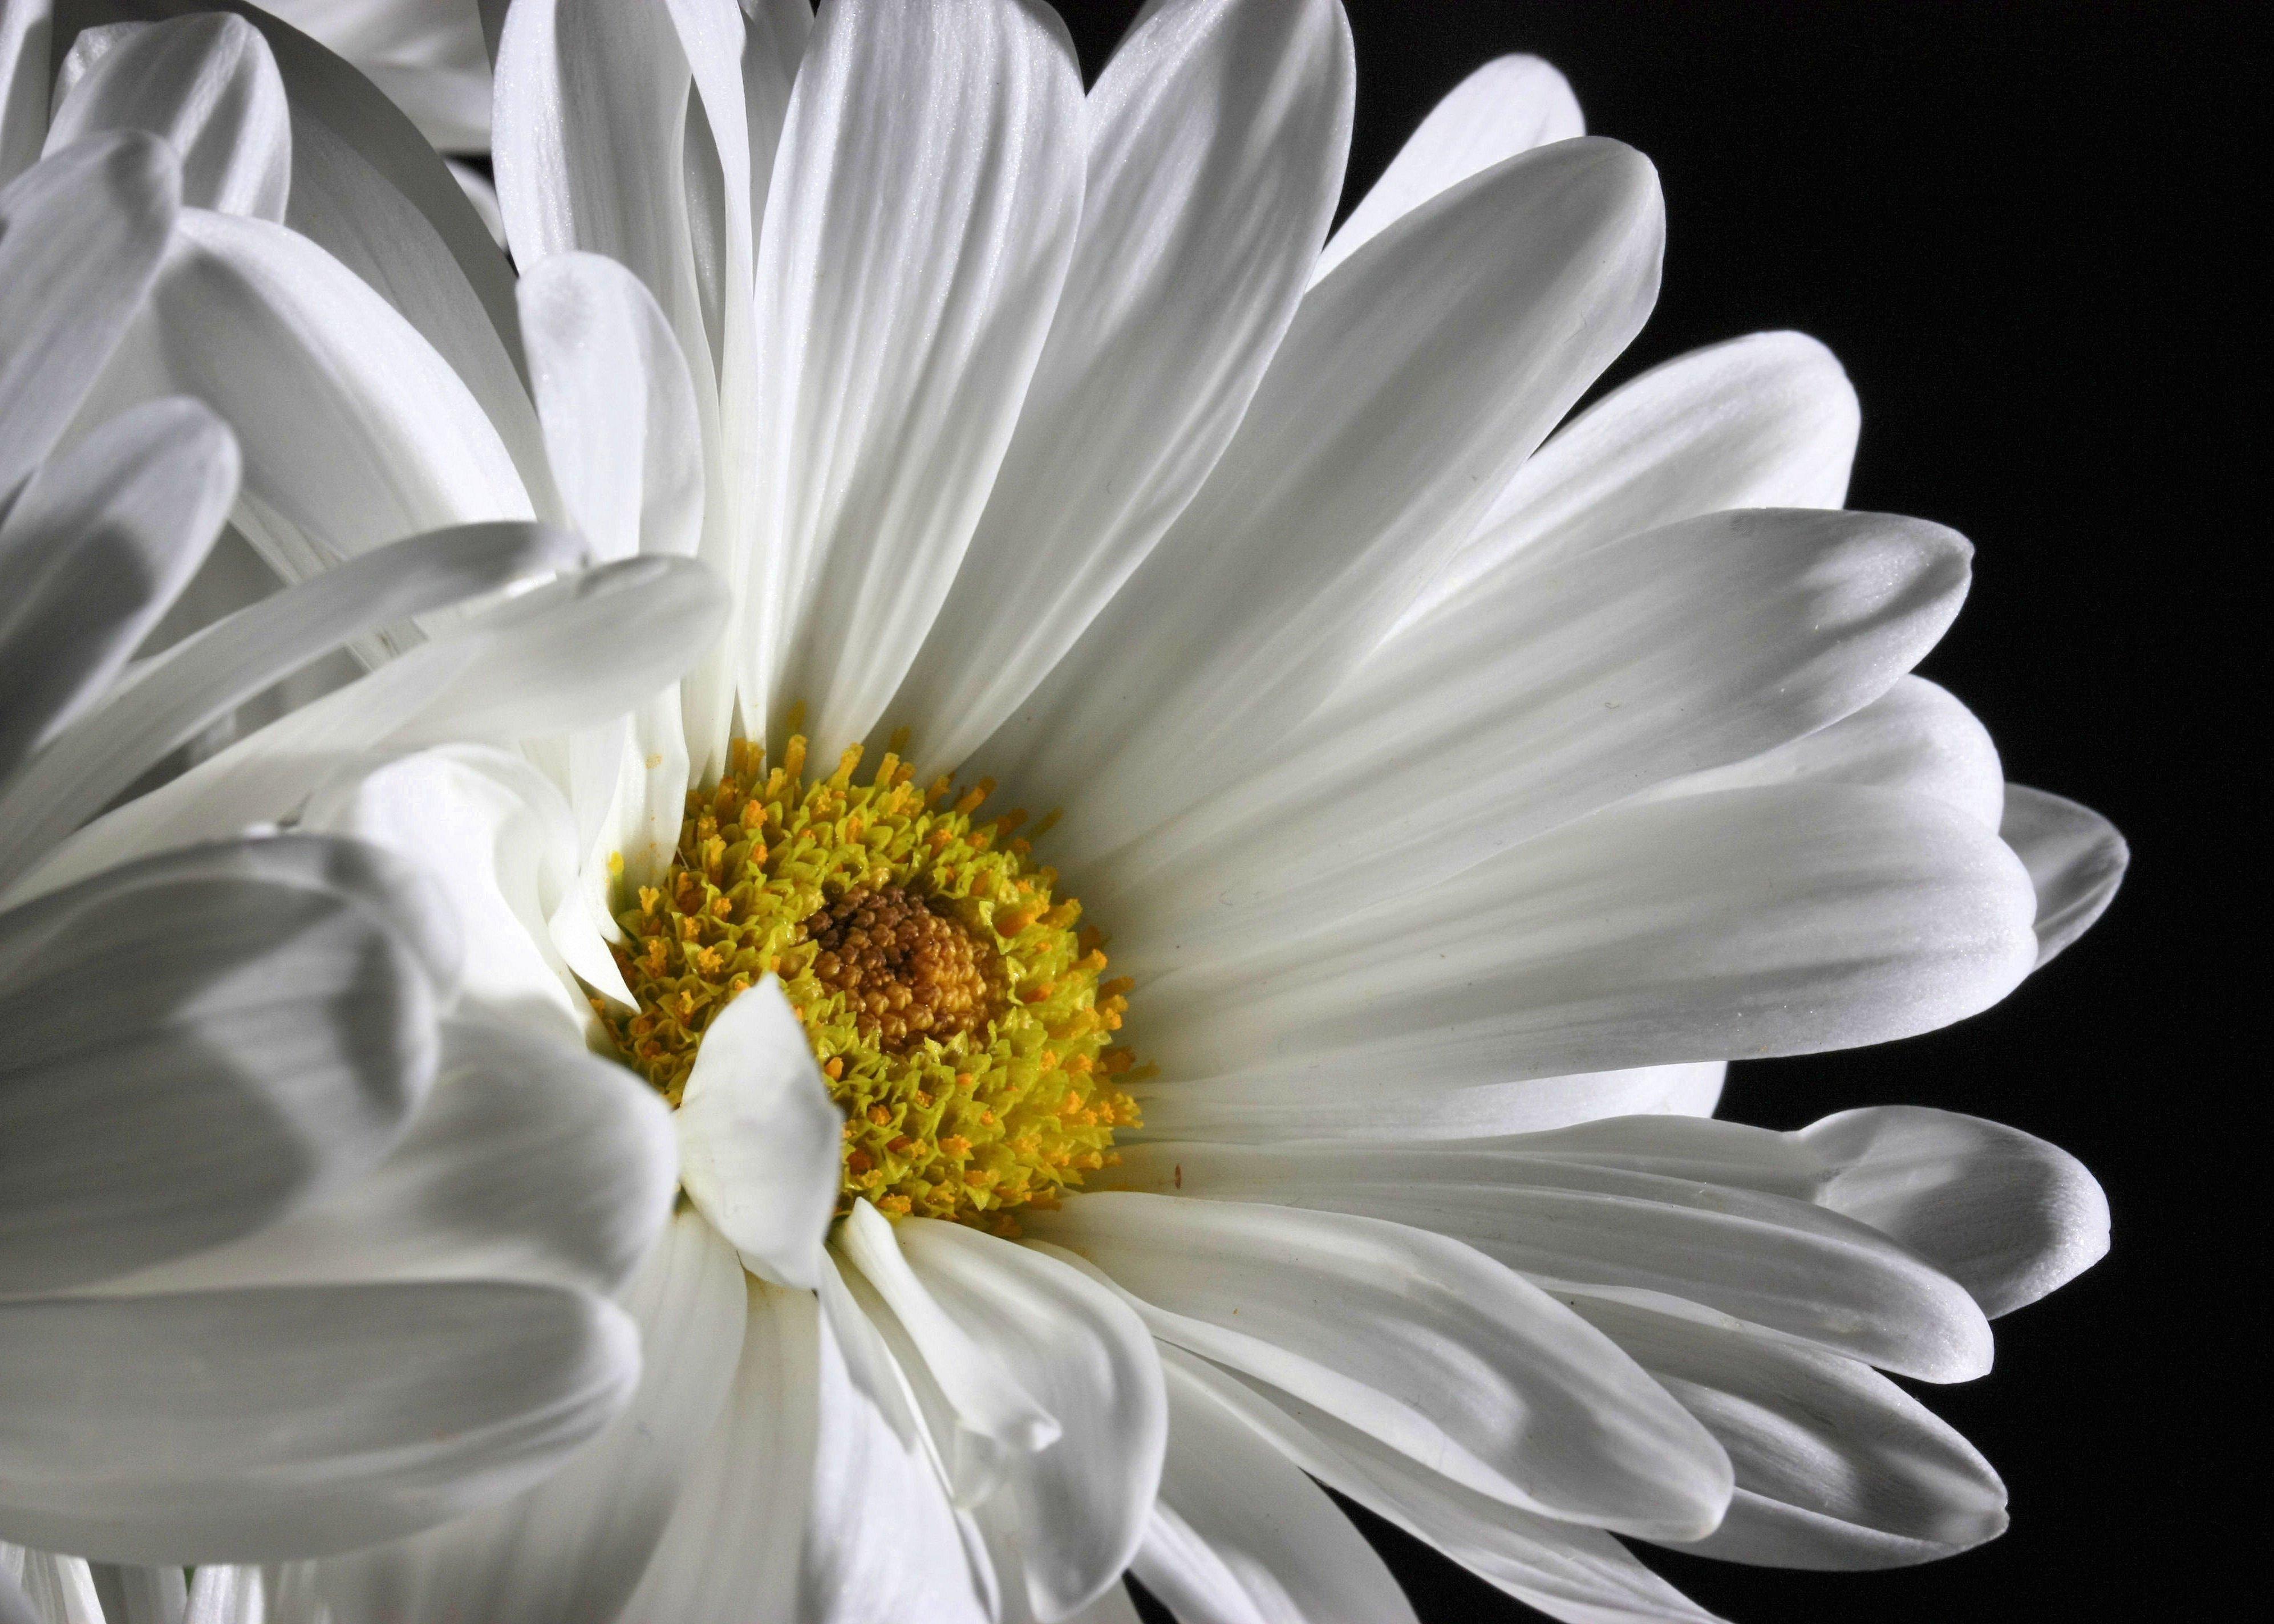 Free Images : blossom, black and white, flower, petal, bloom, fresh ...